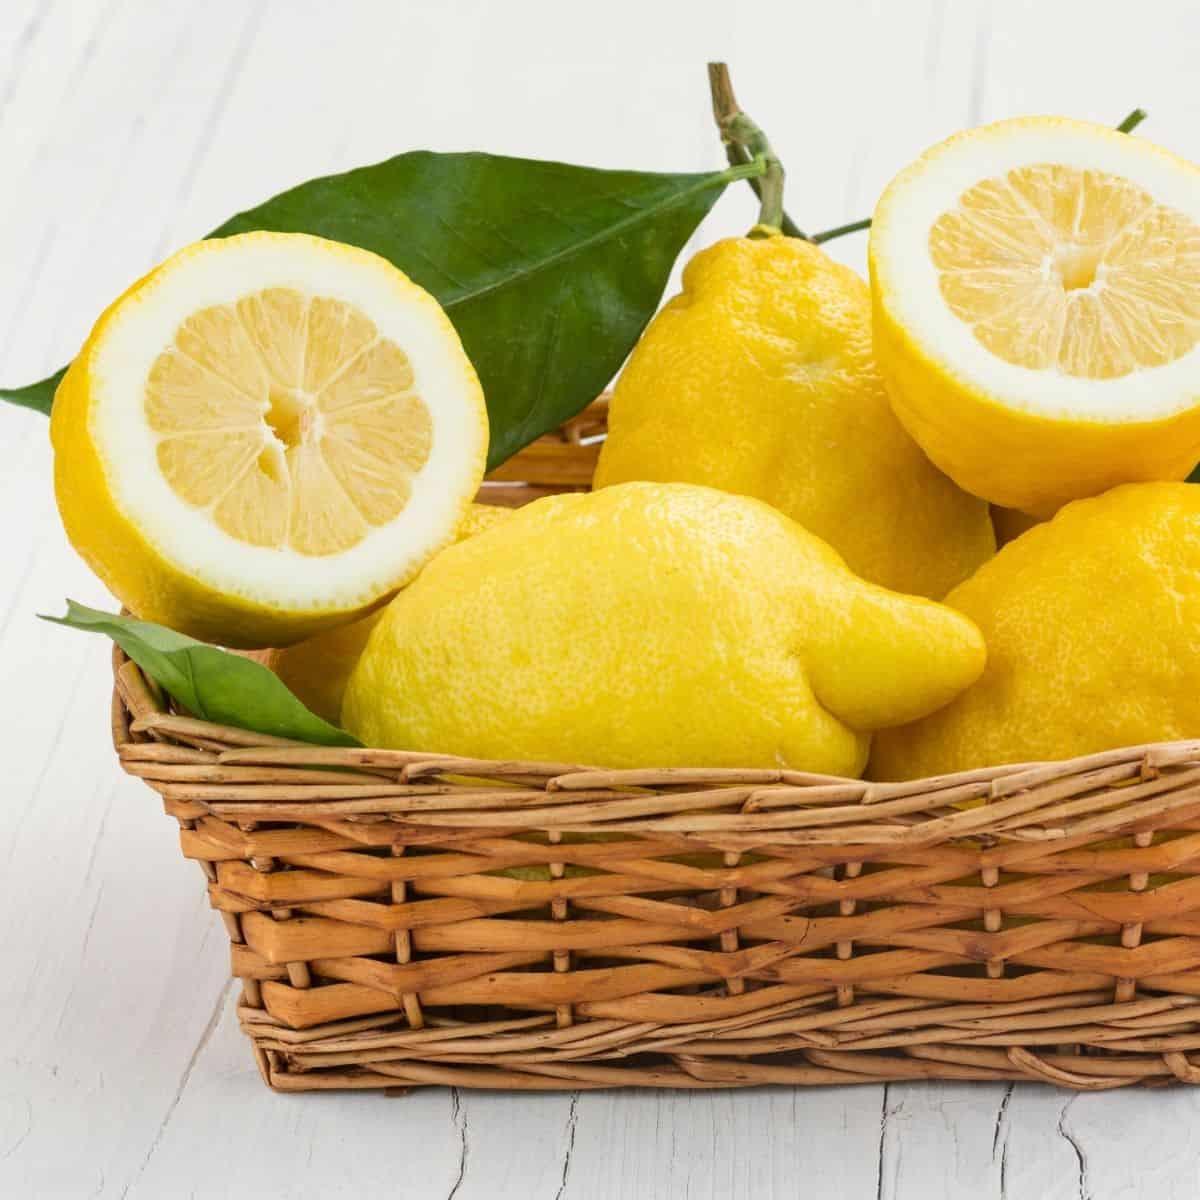 basket of lemons